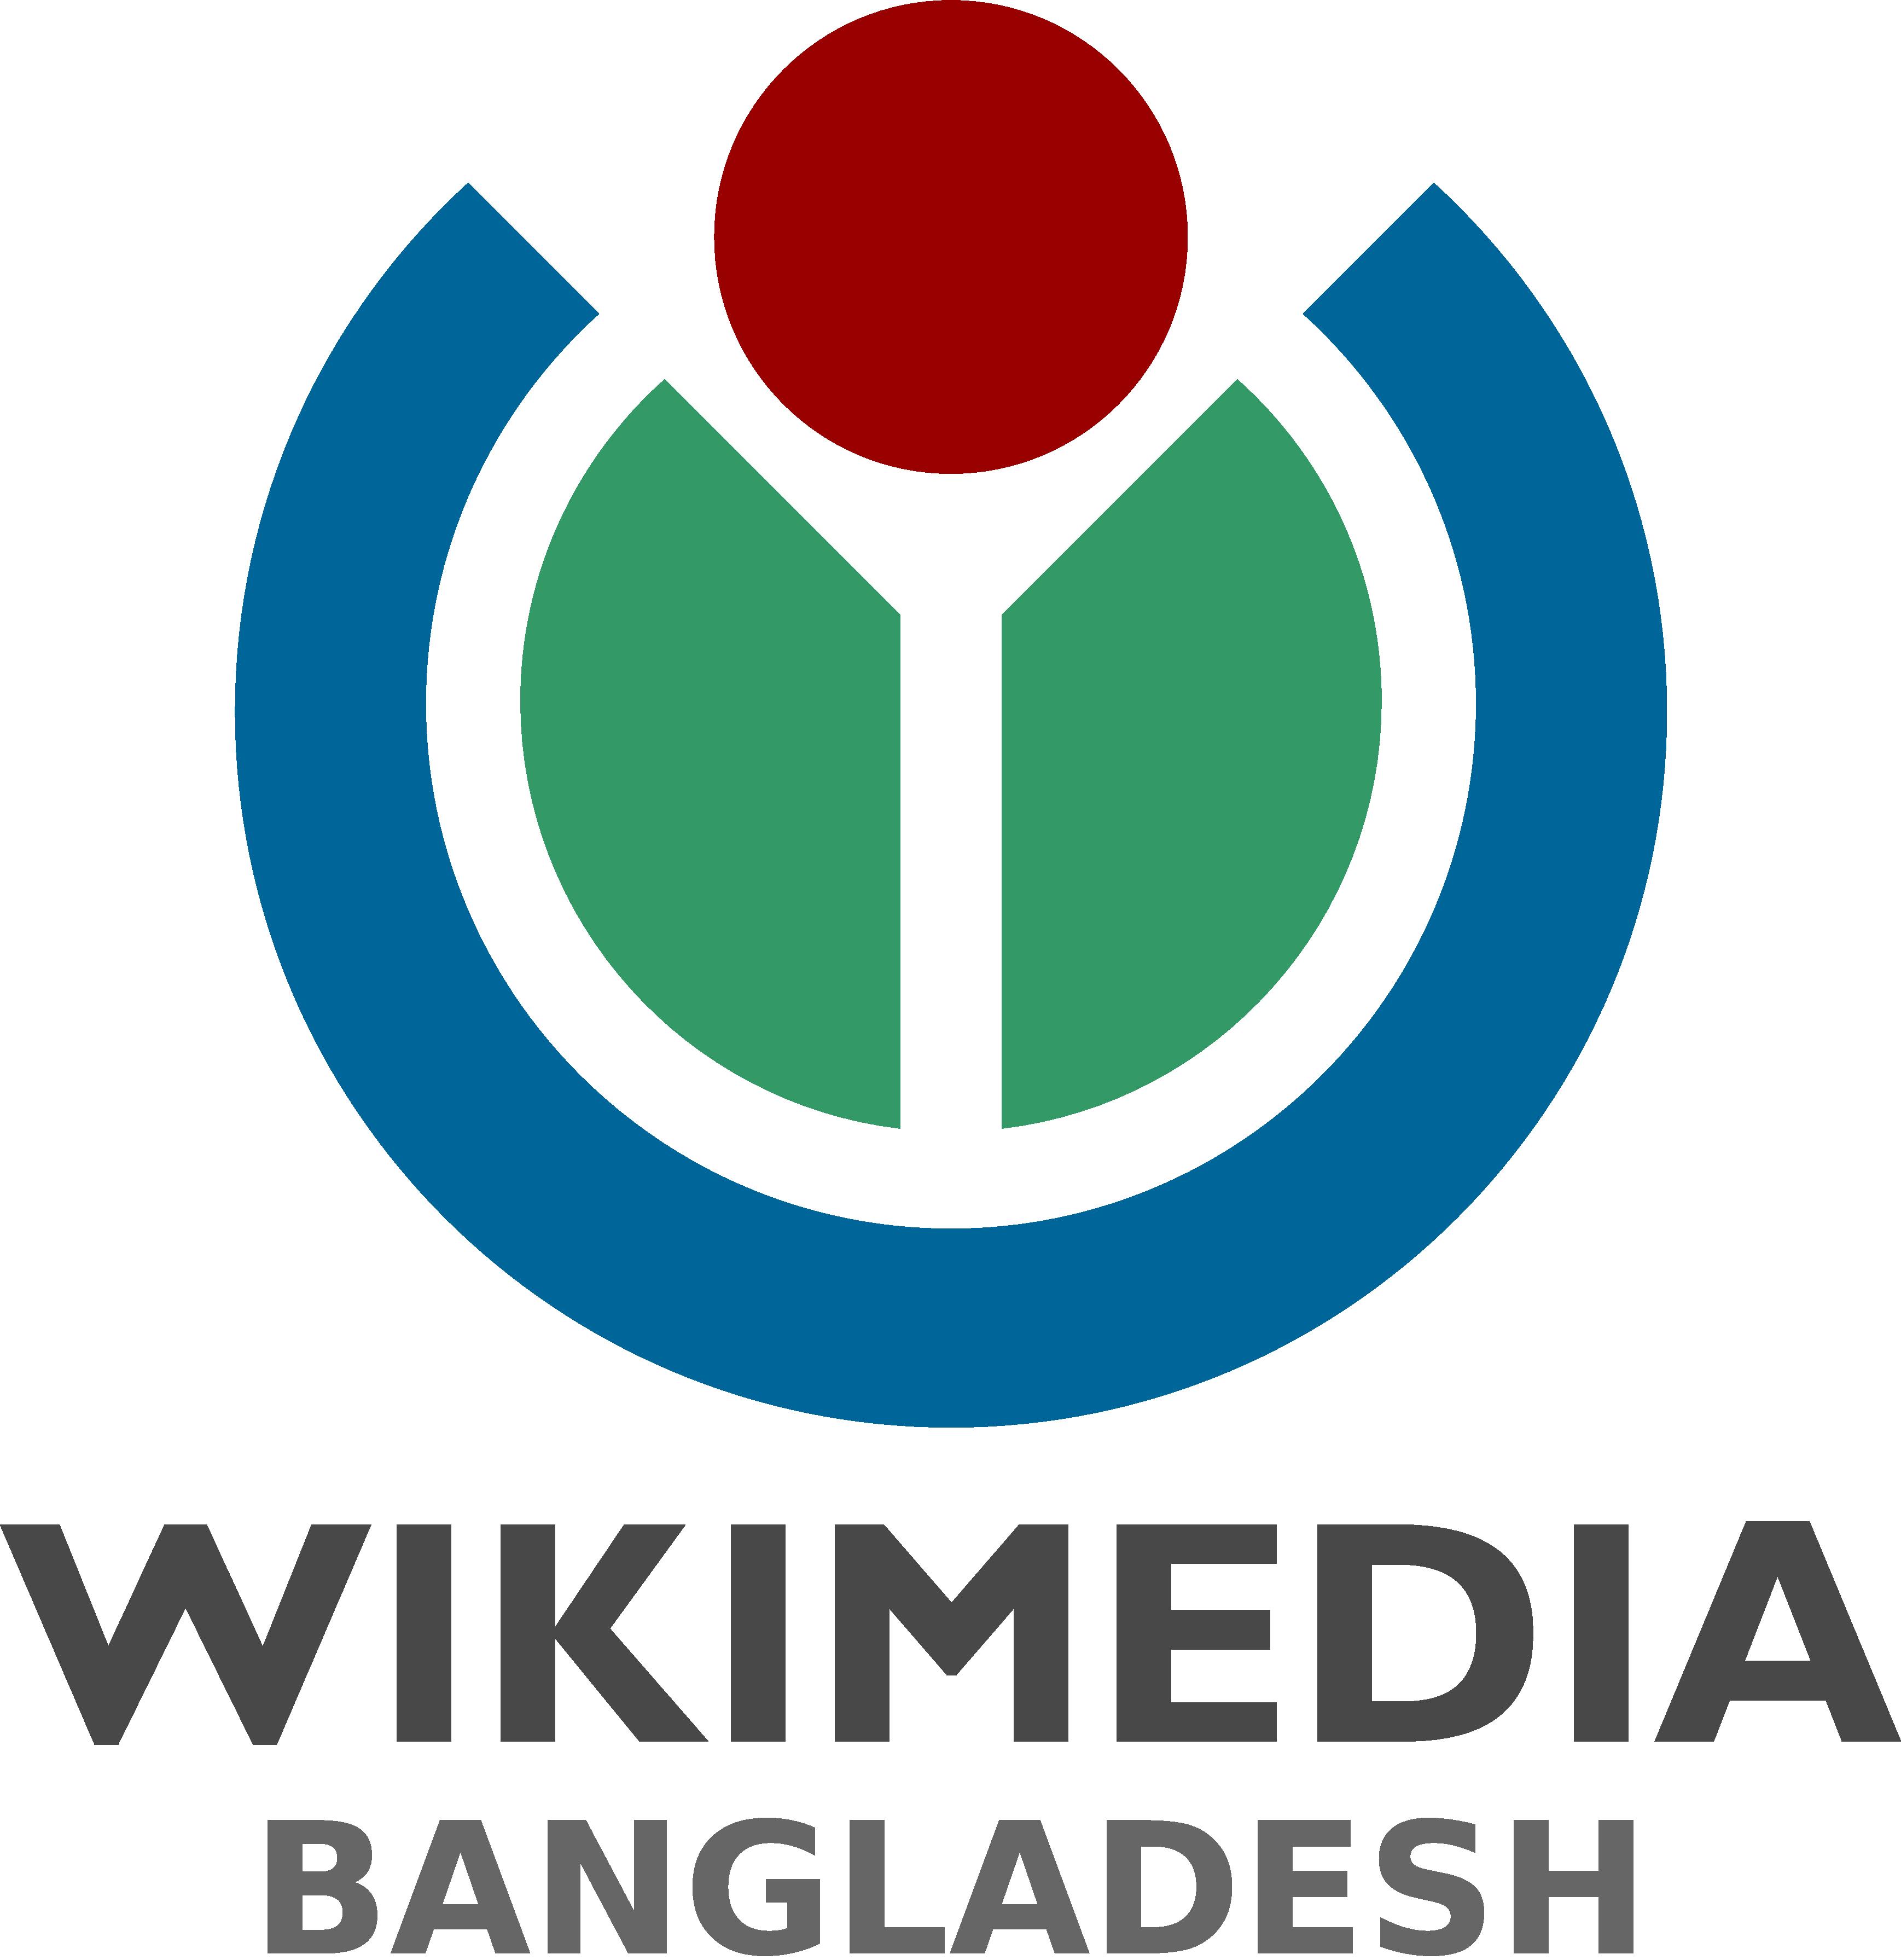 File:Wikimedia Bangladesh logo.png.